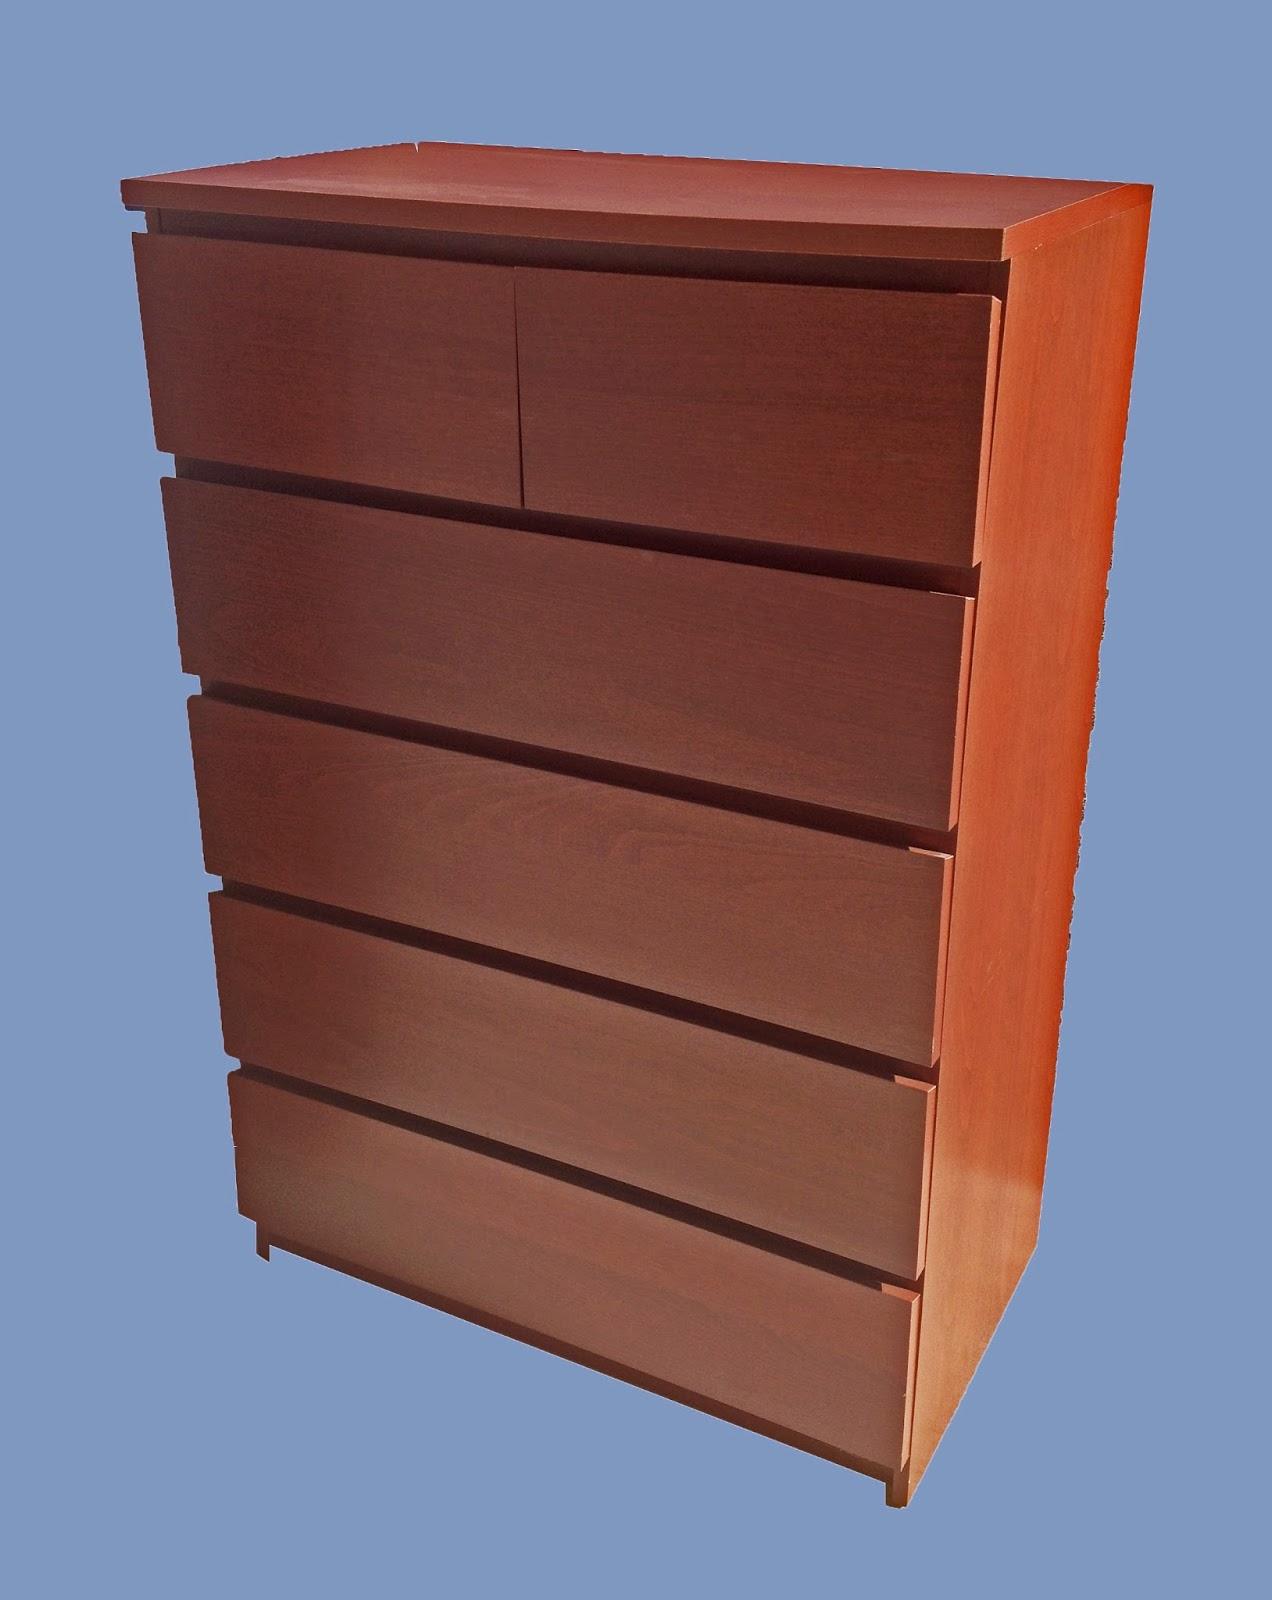 Uhuru Furniture & Collectibles: Ikea Malm Bedroom Set SOLD